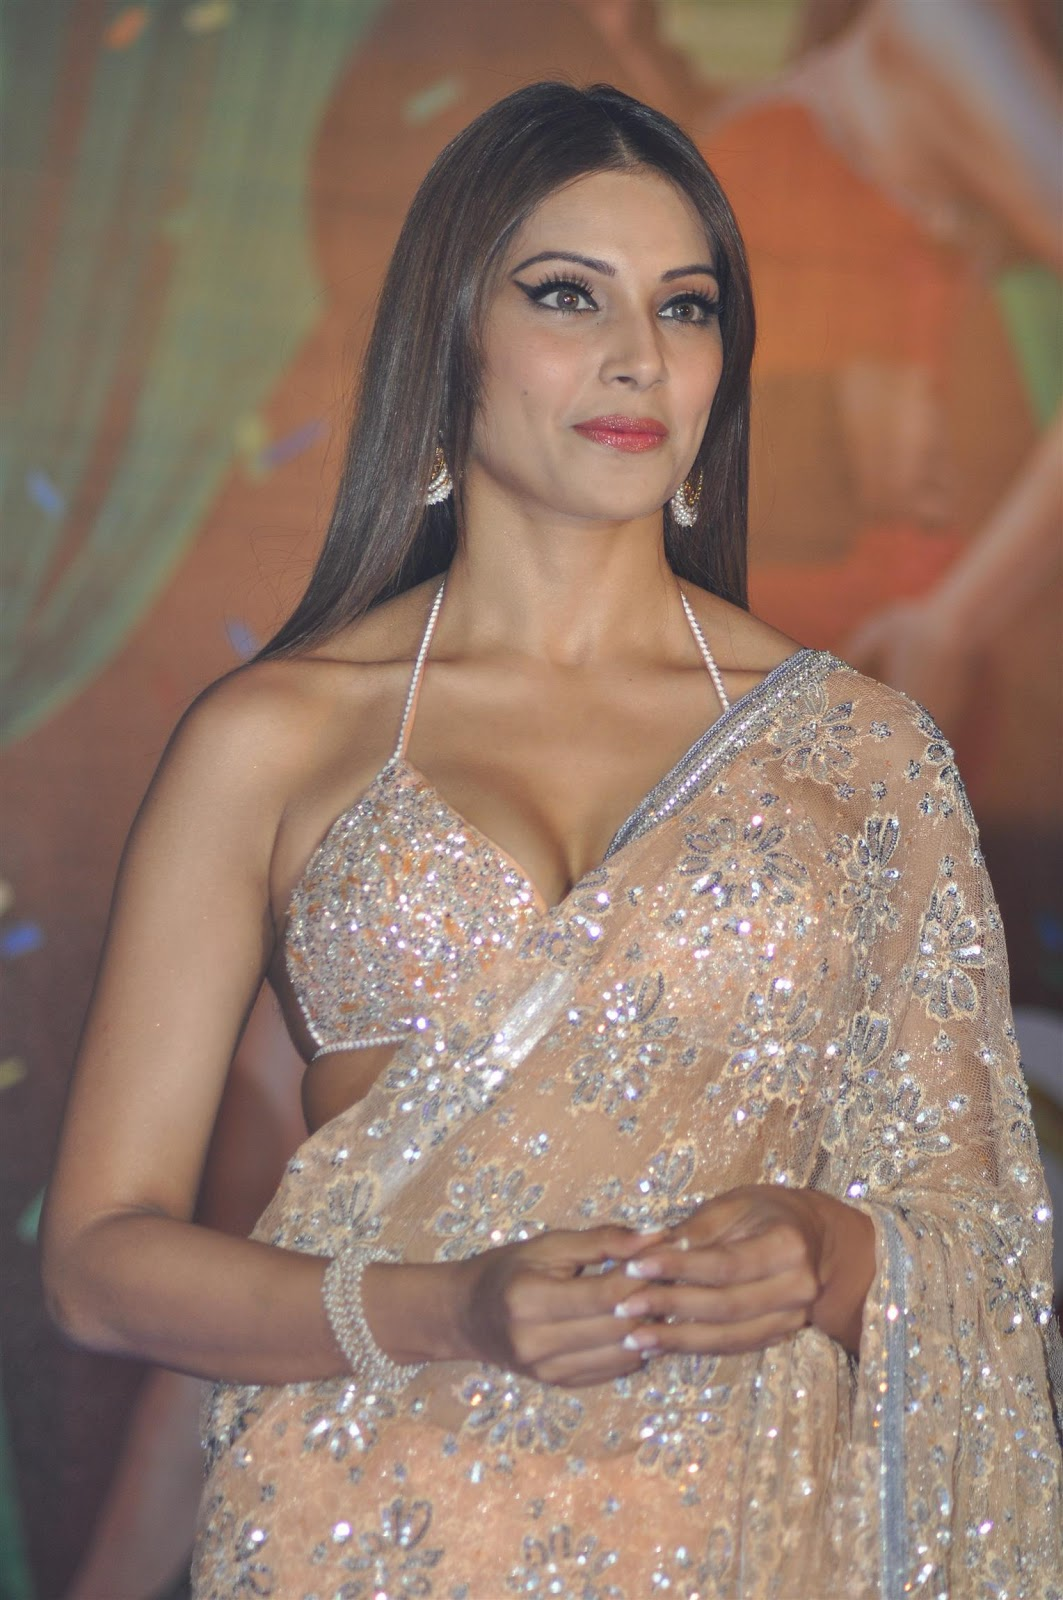 High Quality Bollywood Celebrity Pictures Bipasha Basu -7873